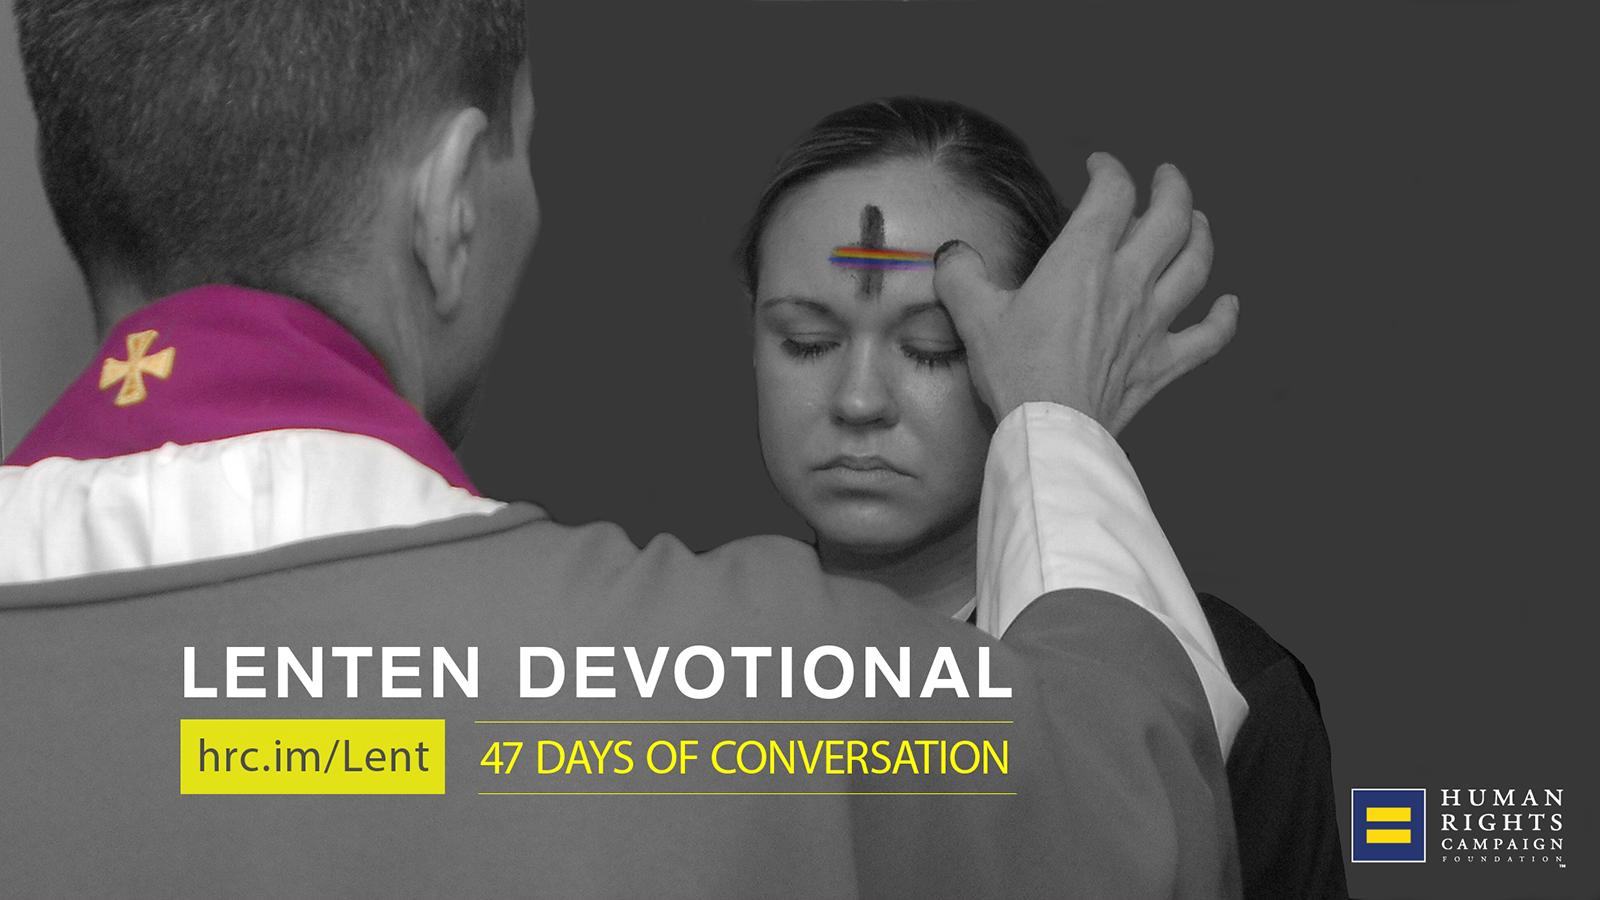 Lenten Devotional: 47 Days of Conversation